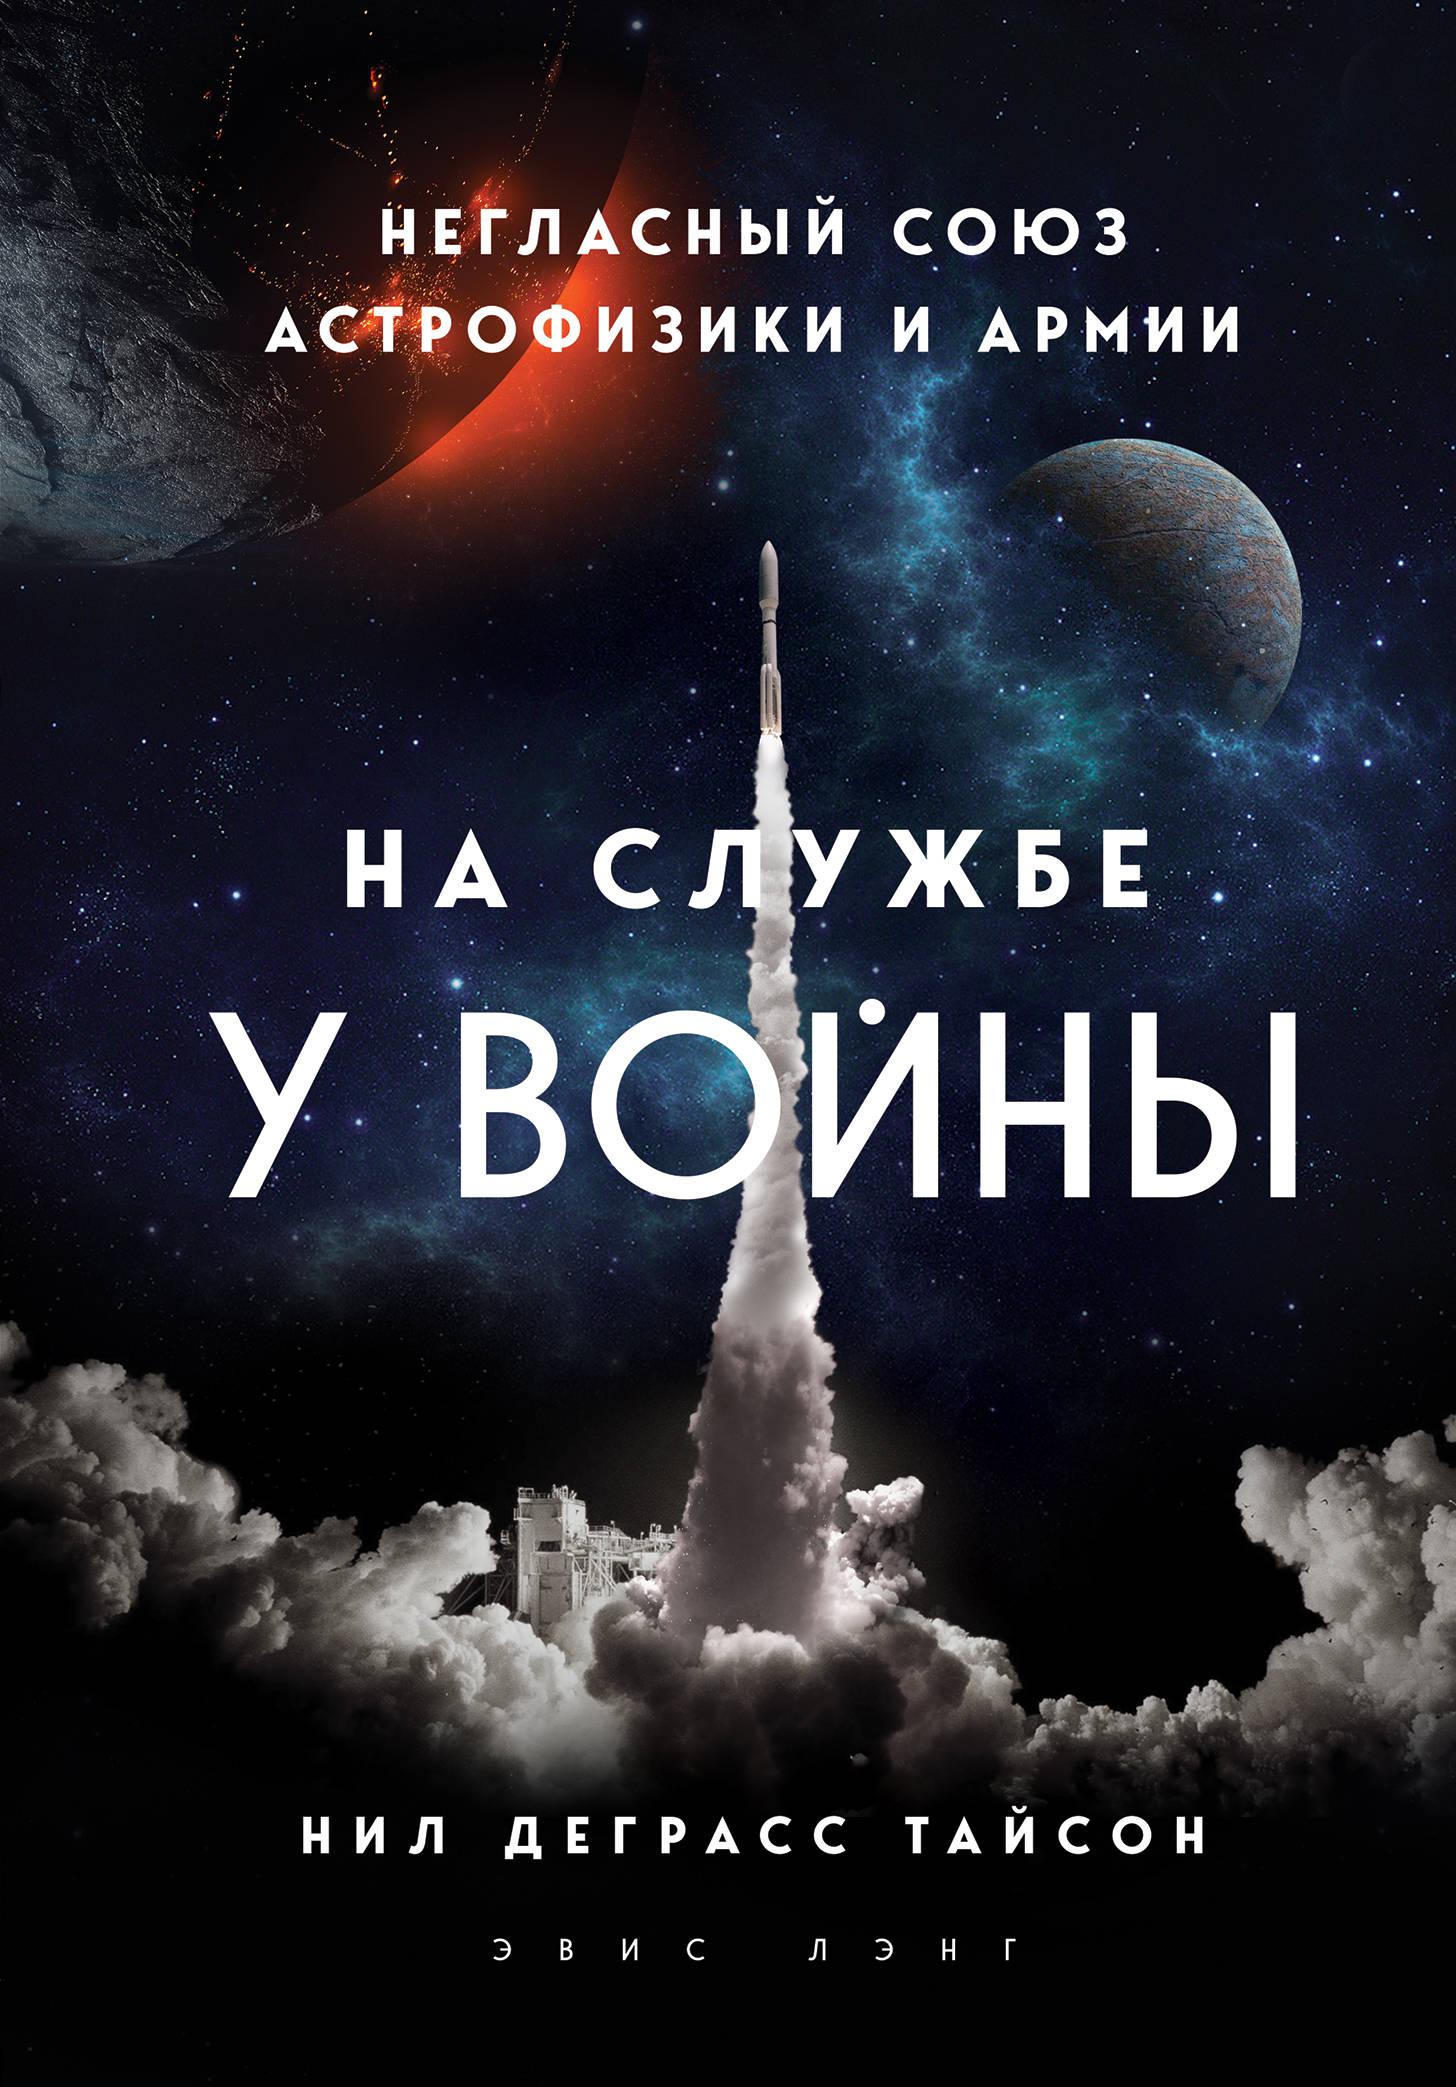 Na sluzhbe u vojny: neglasnyj sojuz astrofiziki i armii